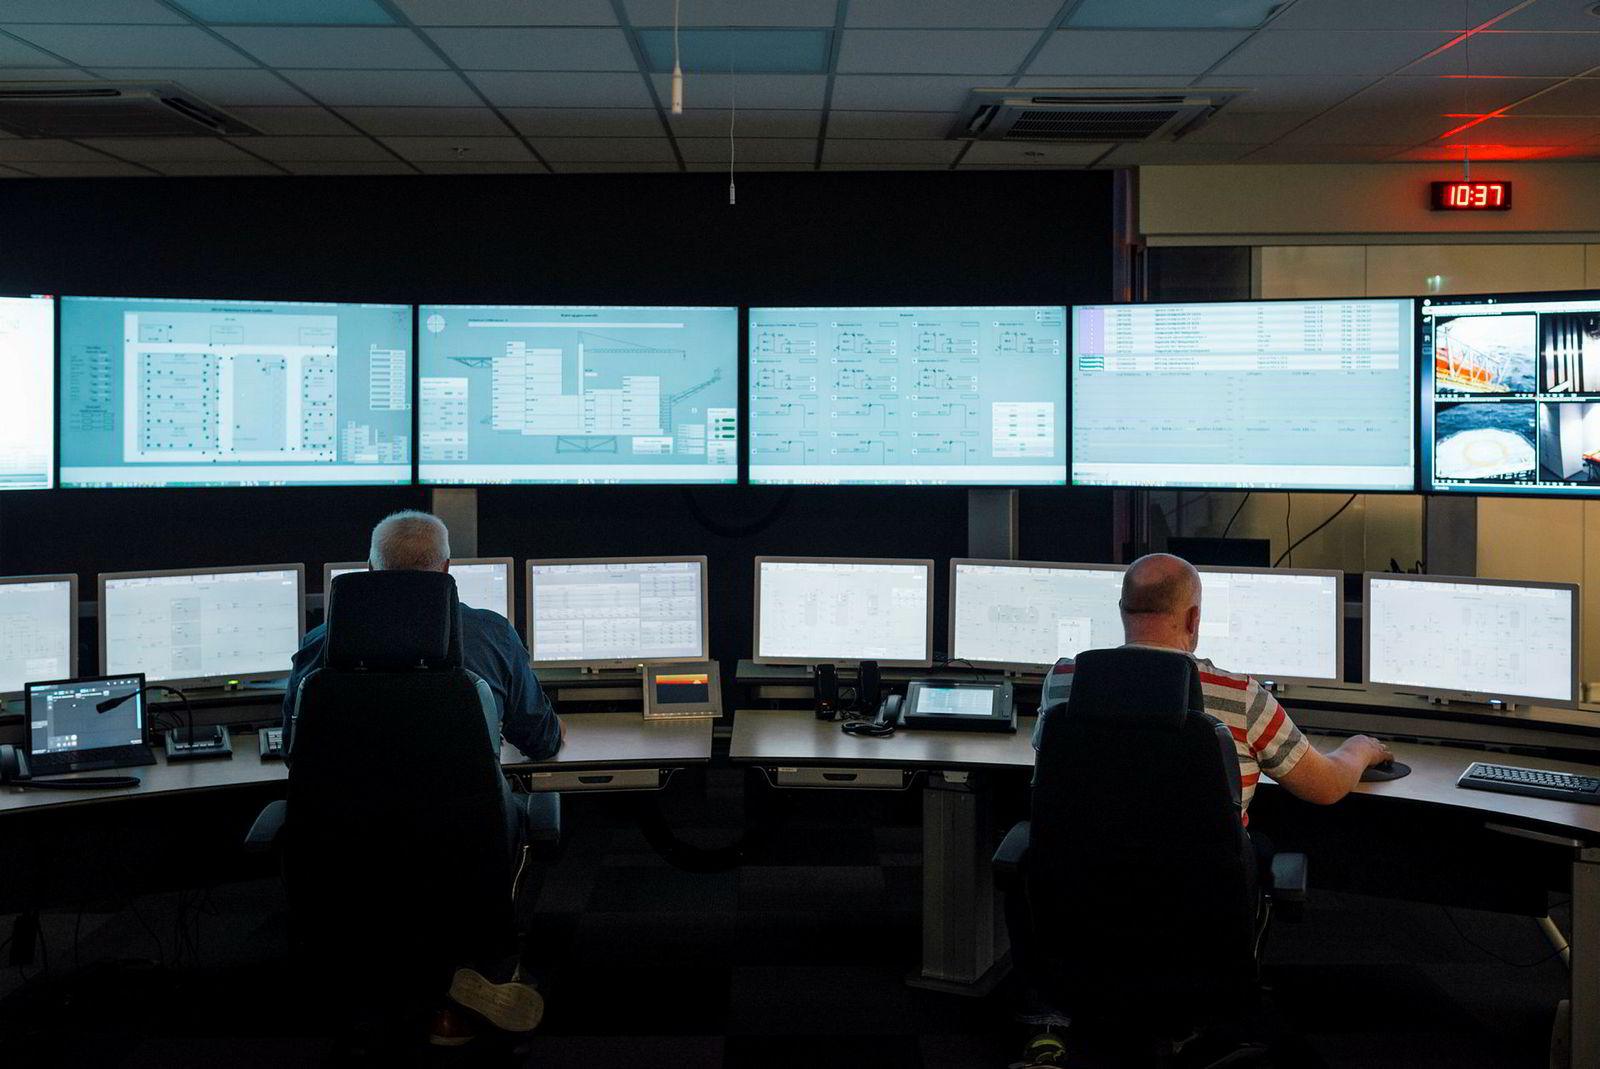 Kontrollrommet i Trondheim gir full kontroll over plattformen.